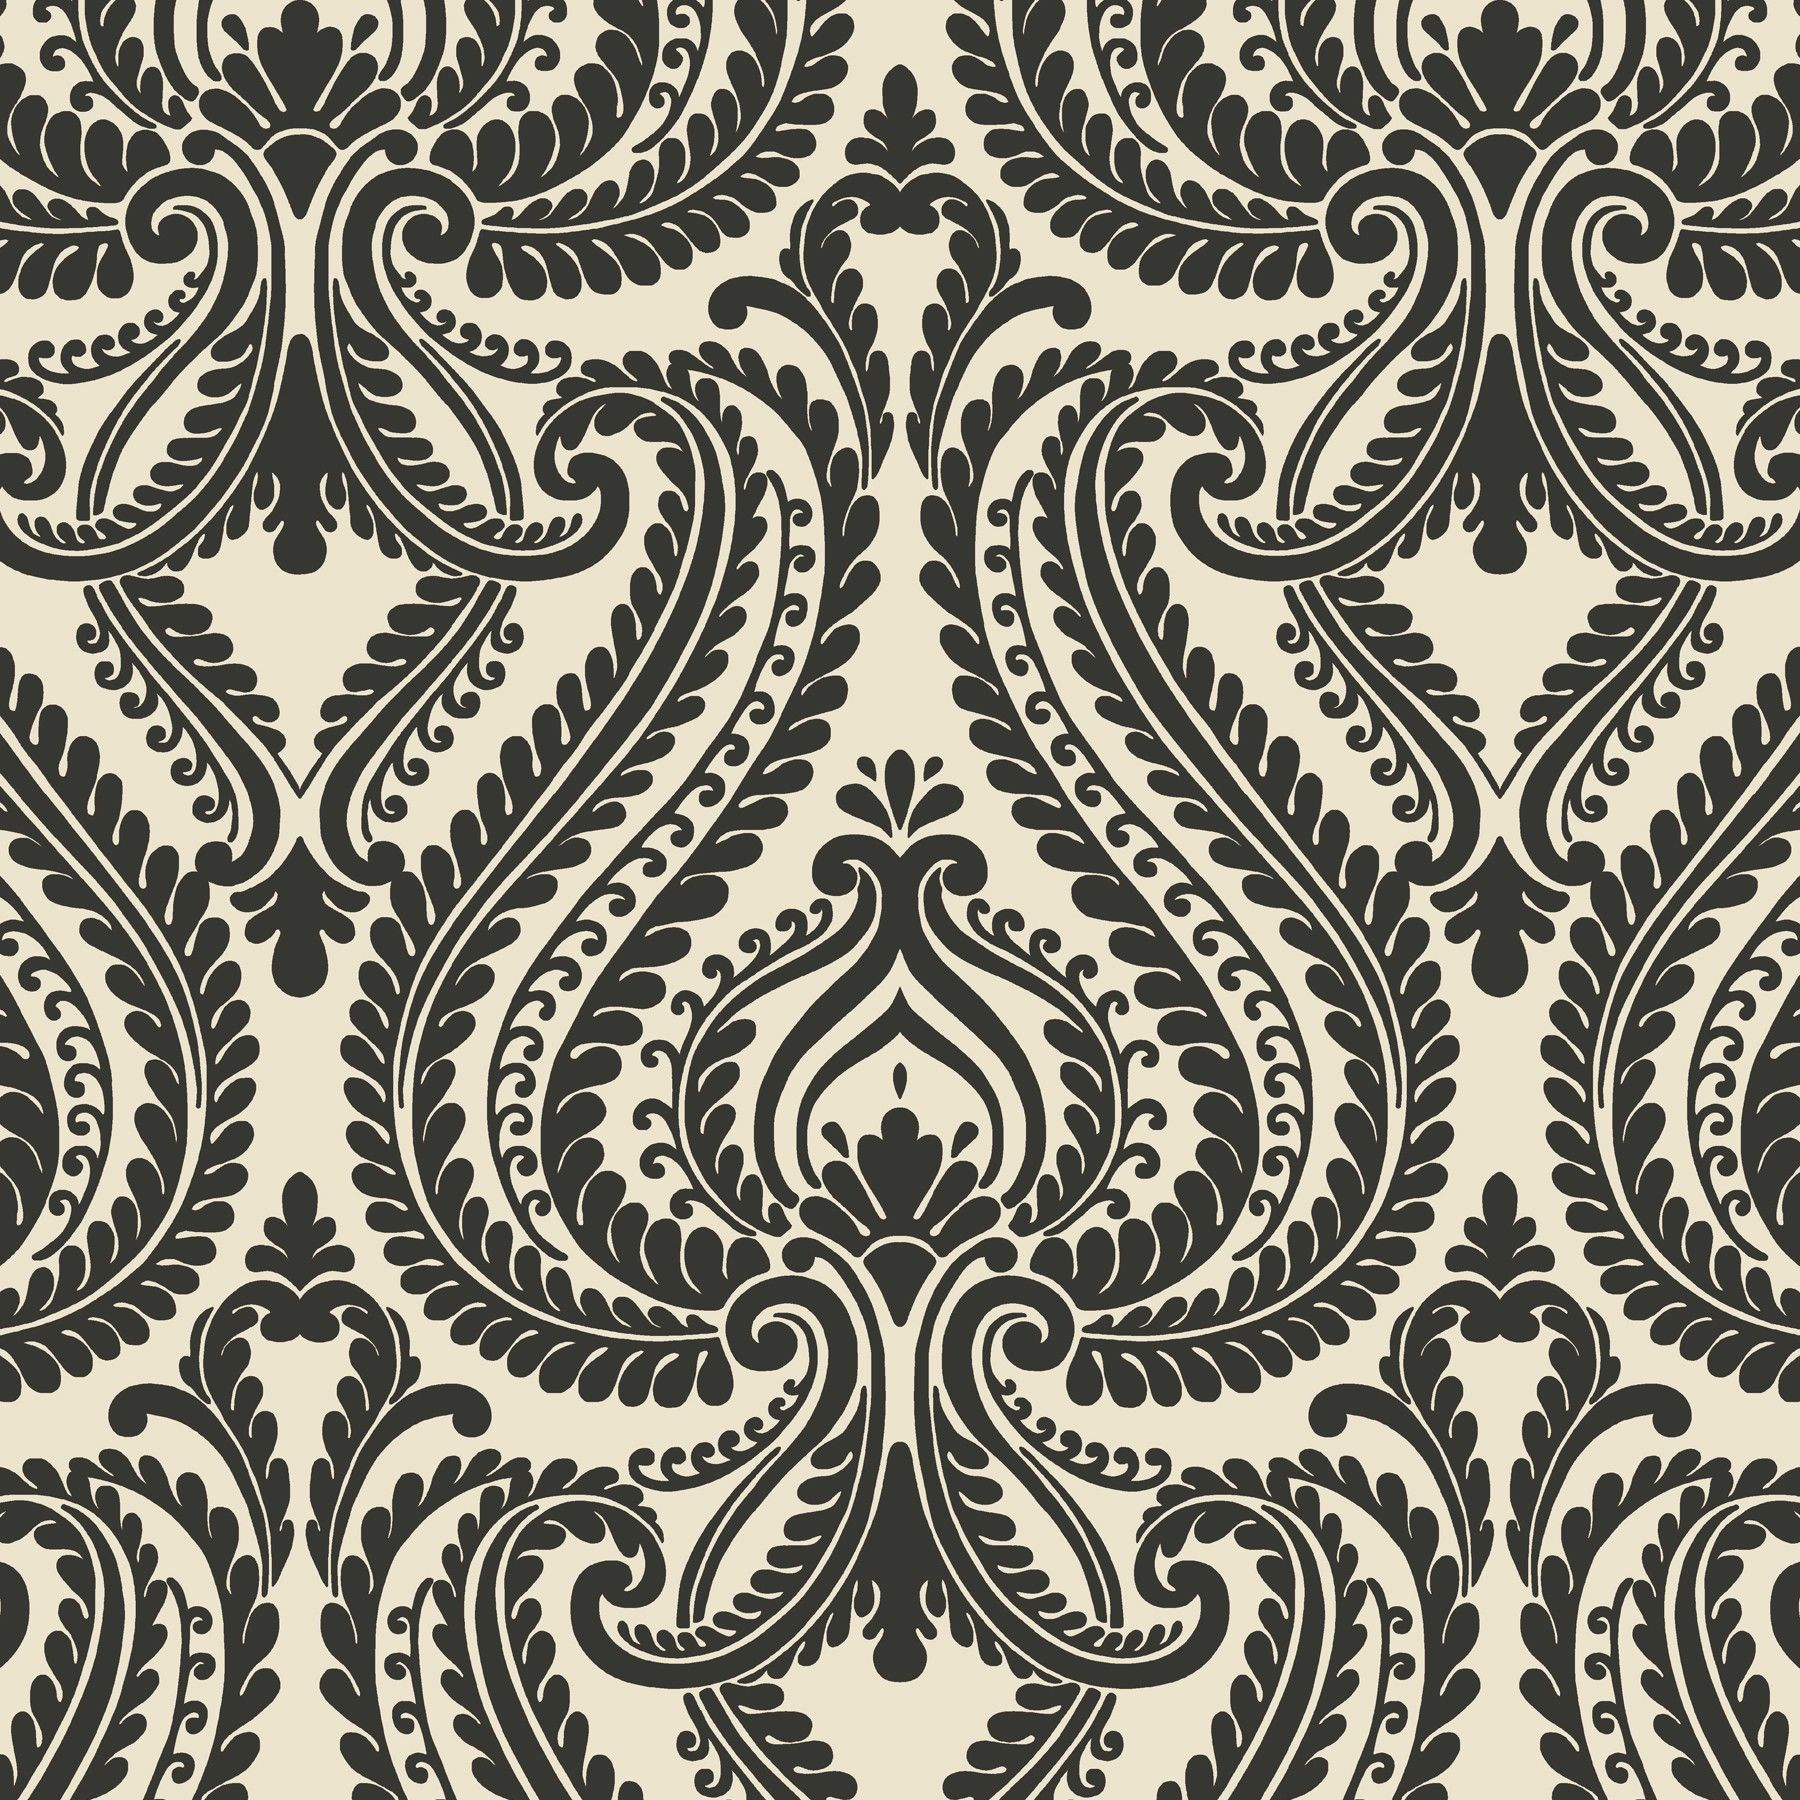 simple damask wallpaper patterns - HD1800×1800